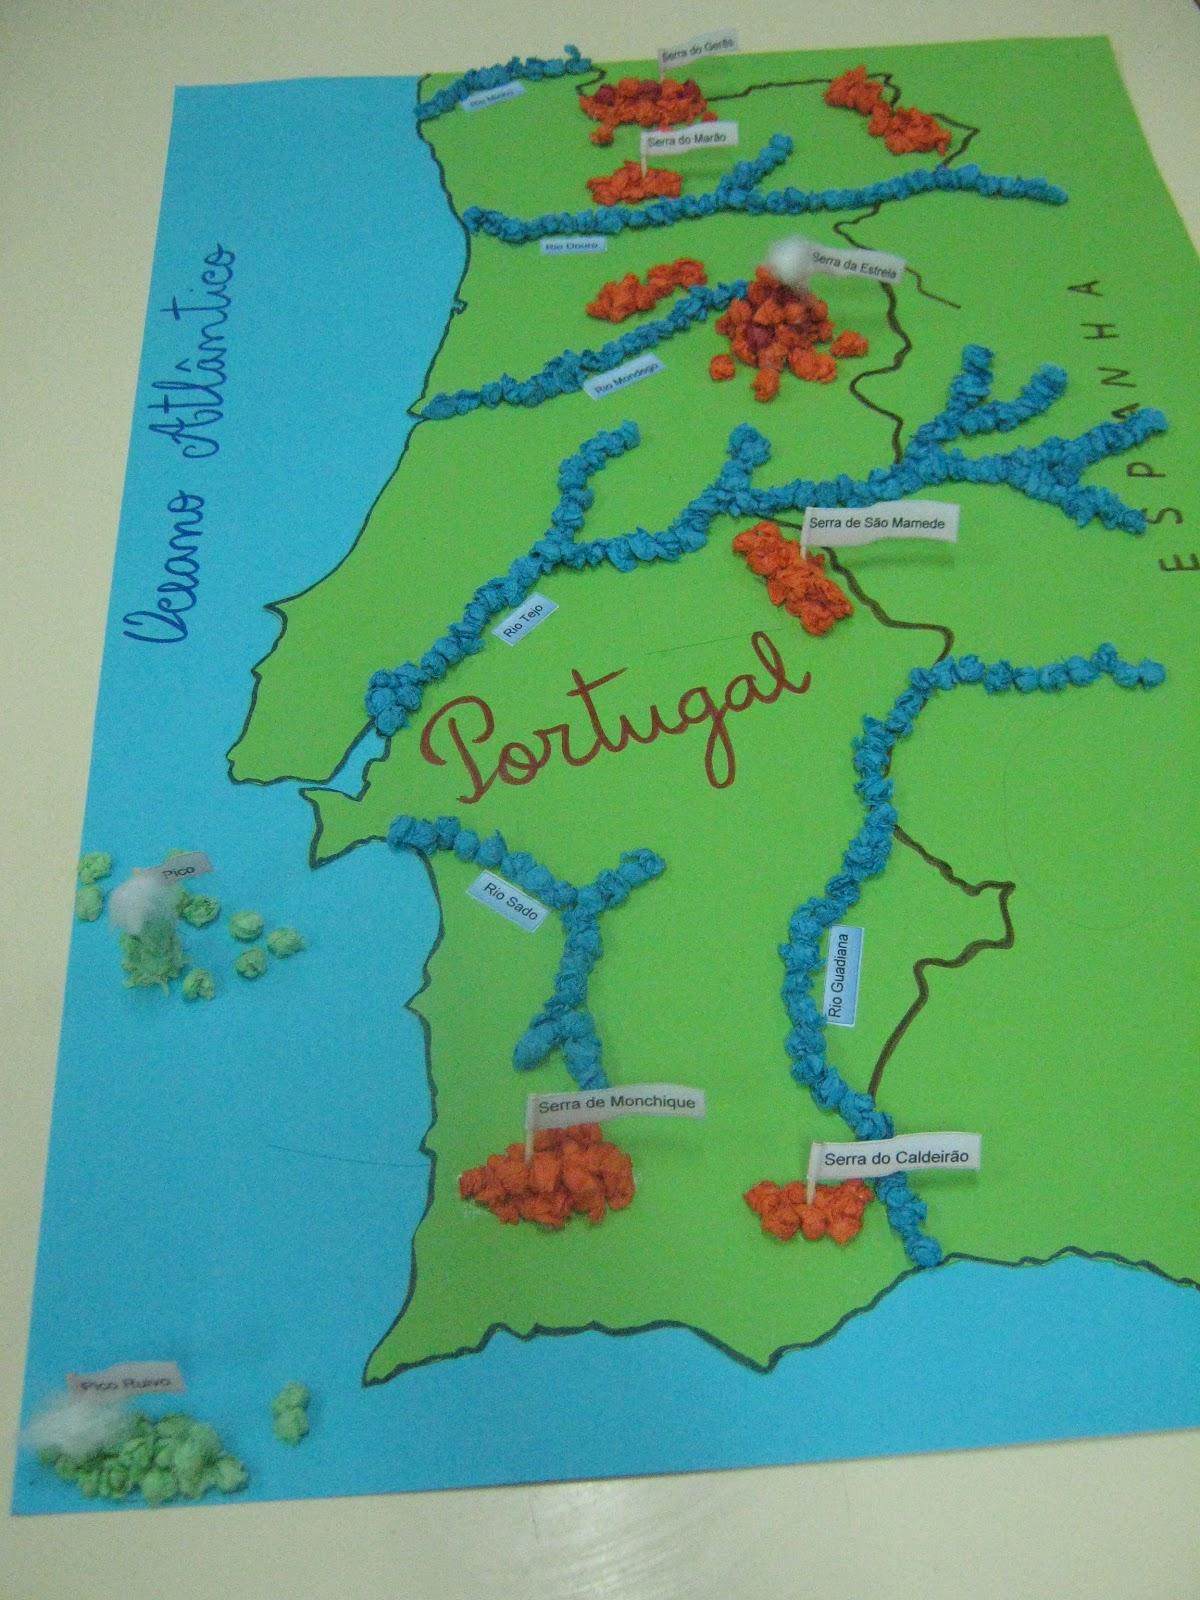 mapa de rios e serras de portugal Damas e Piratinhas: RIOS E SERRAS mapa de rios e serras de portugal